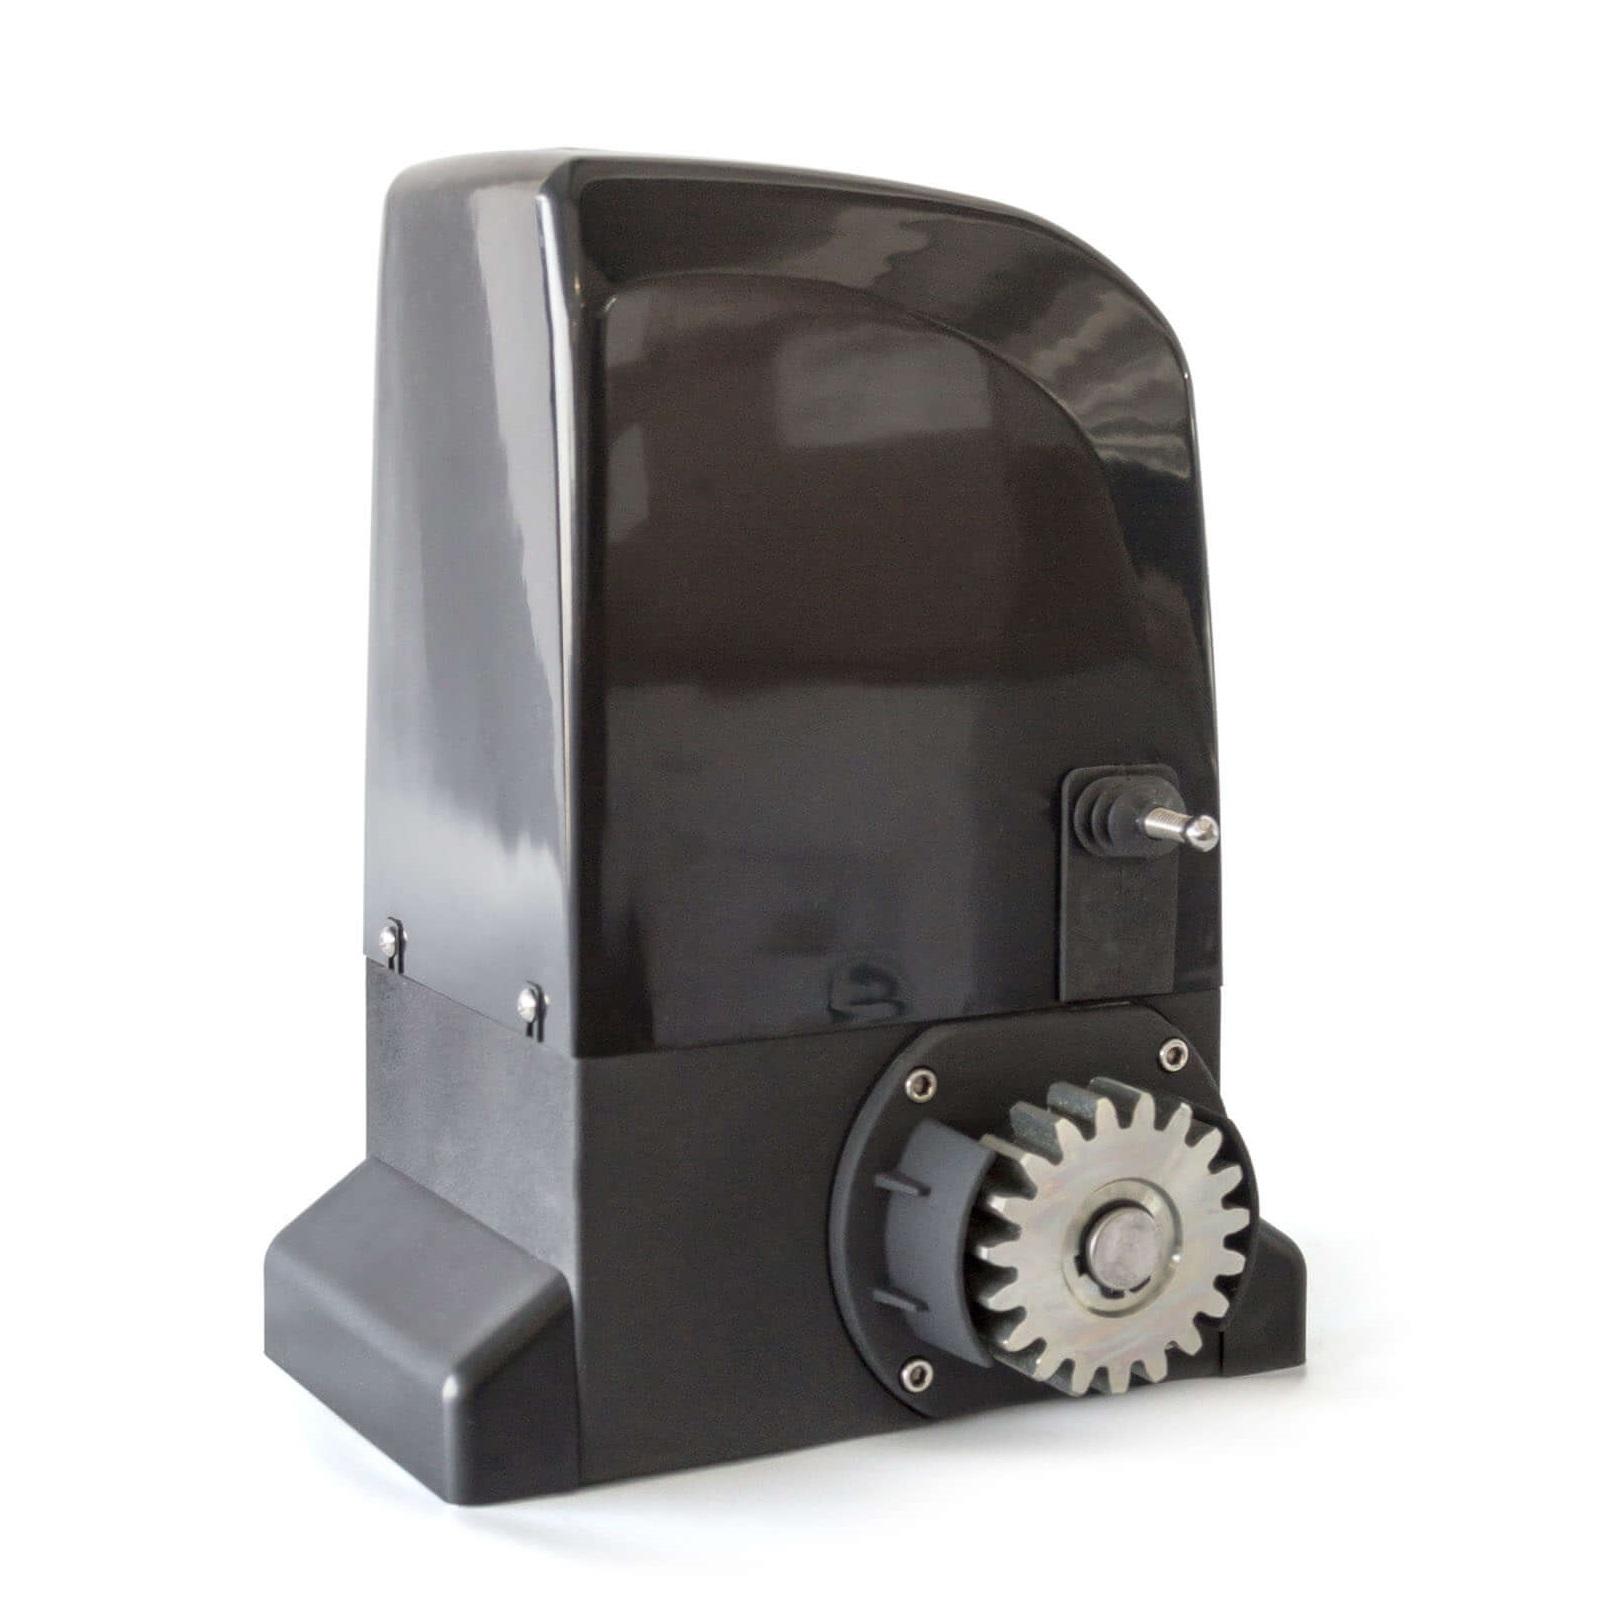 Motorline slide 1024 motor puerta corredera instalmatic for Motor puerta automatica